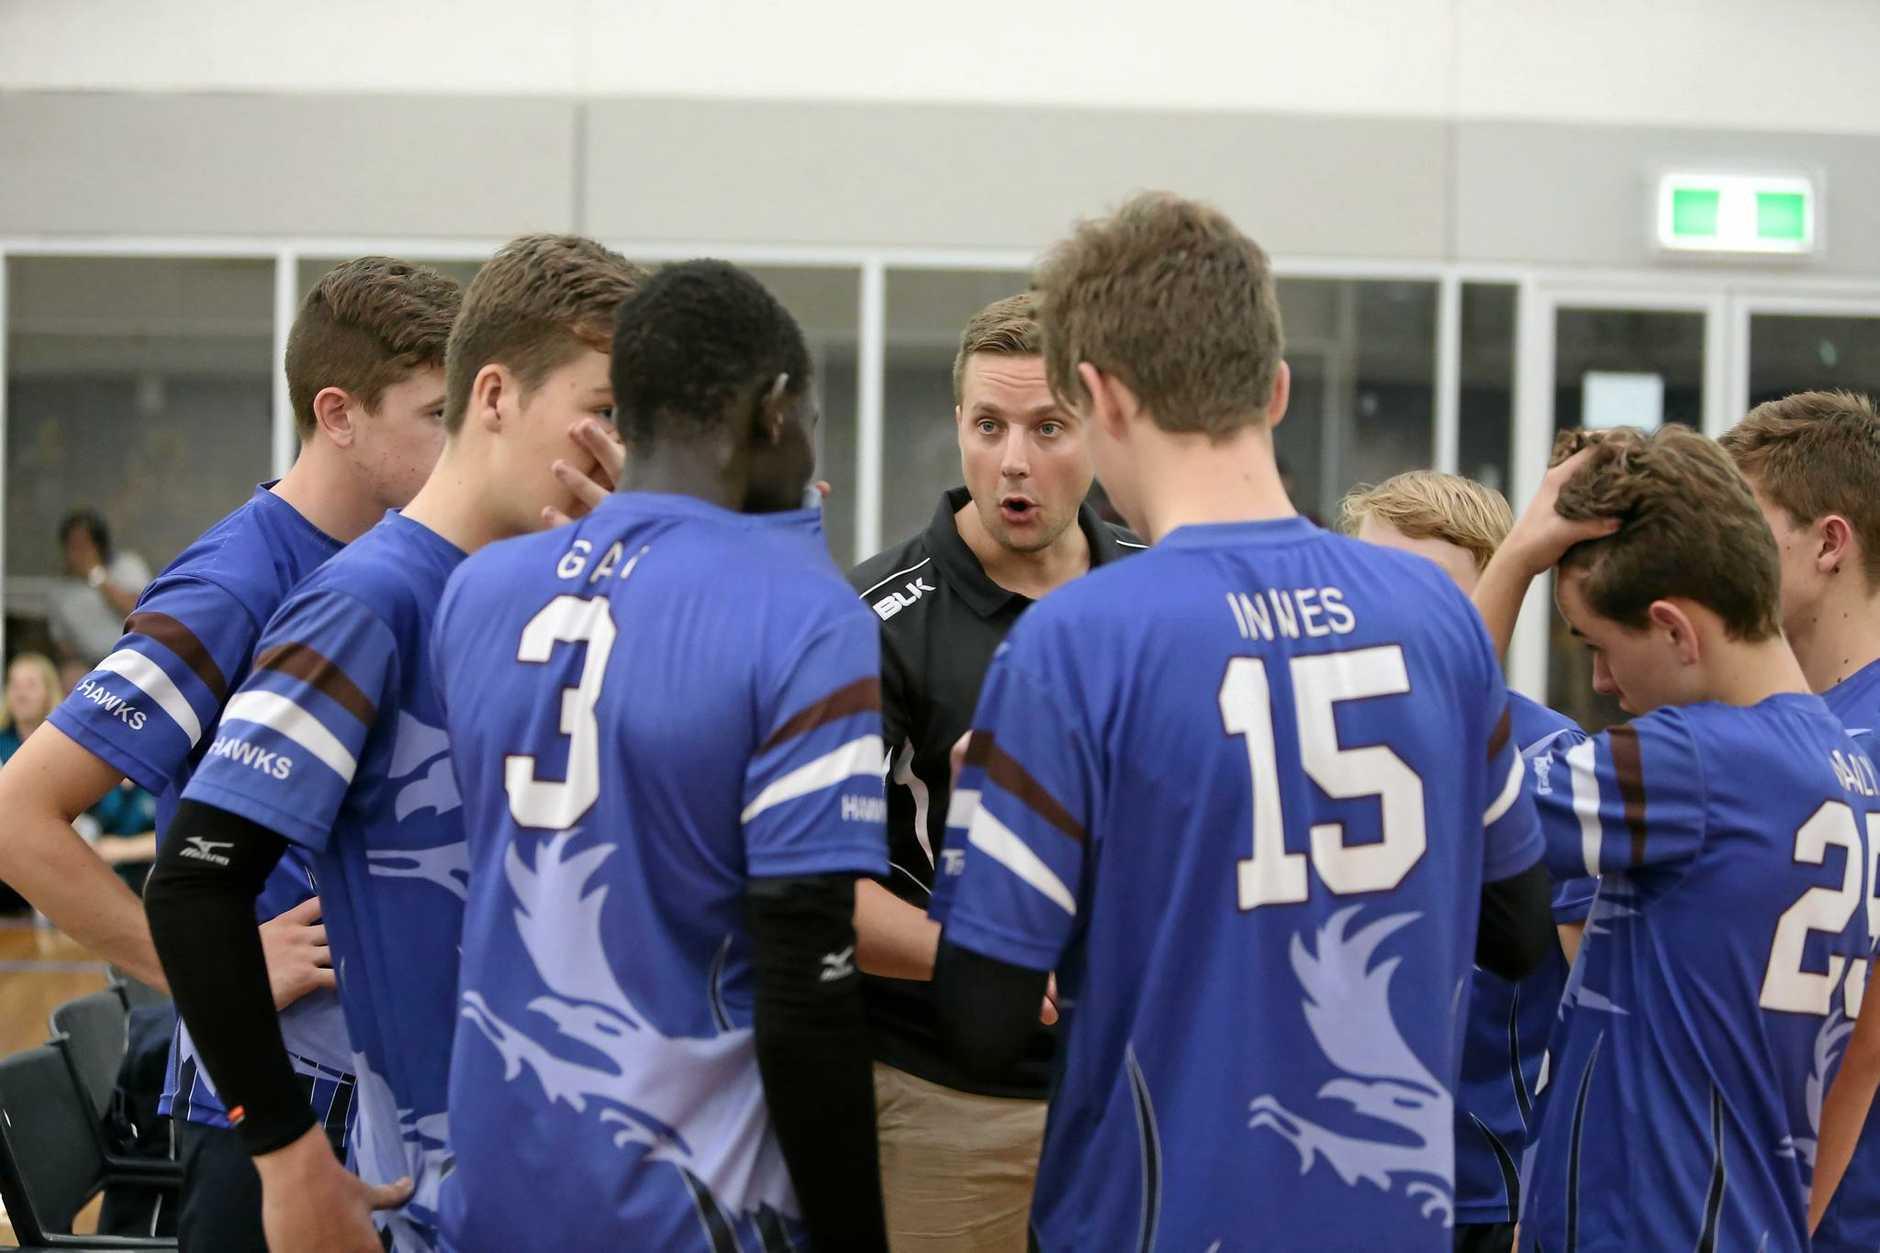 Harristown Hawks under 16 boys (from left) Jake Jarick, Bevan Fry, Gai Gai, Jamie Krisanski (Coach), Jack Innes, Russell Chambers, Zach Manly and Trent Knight.